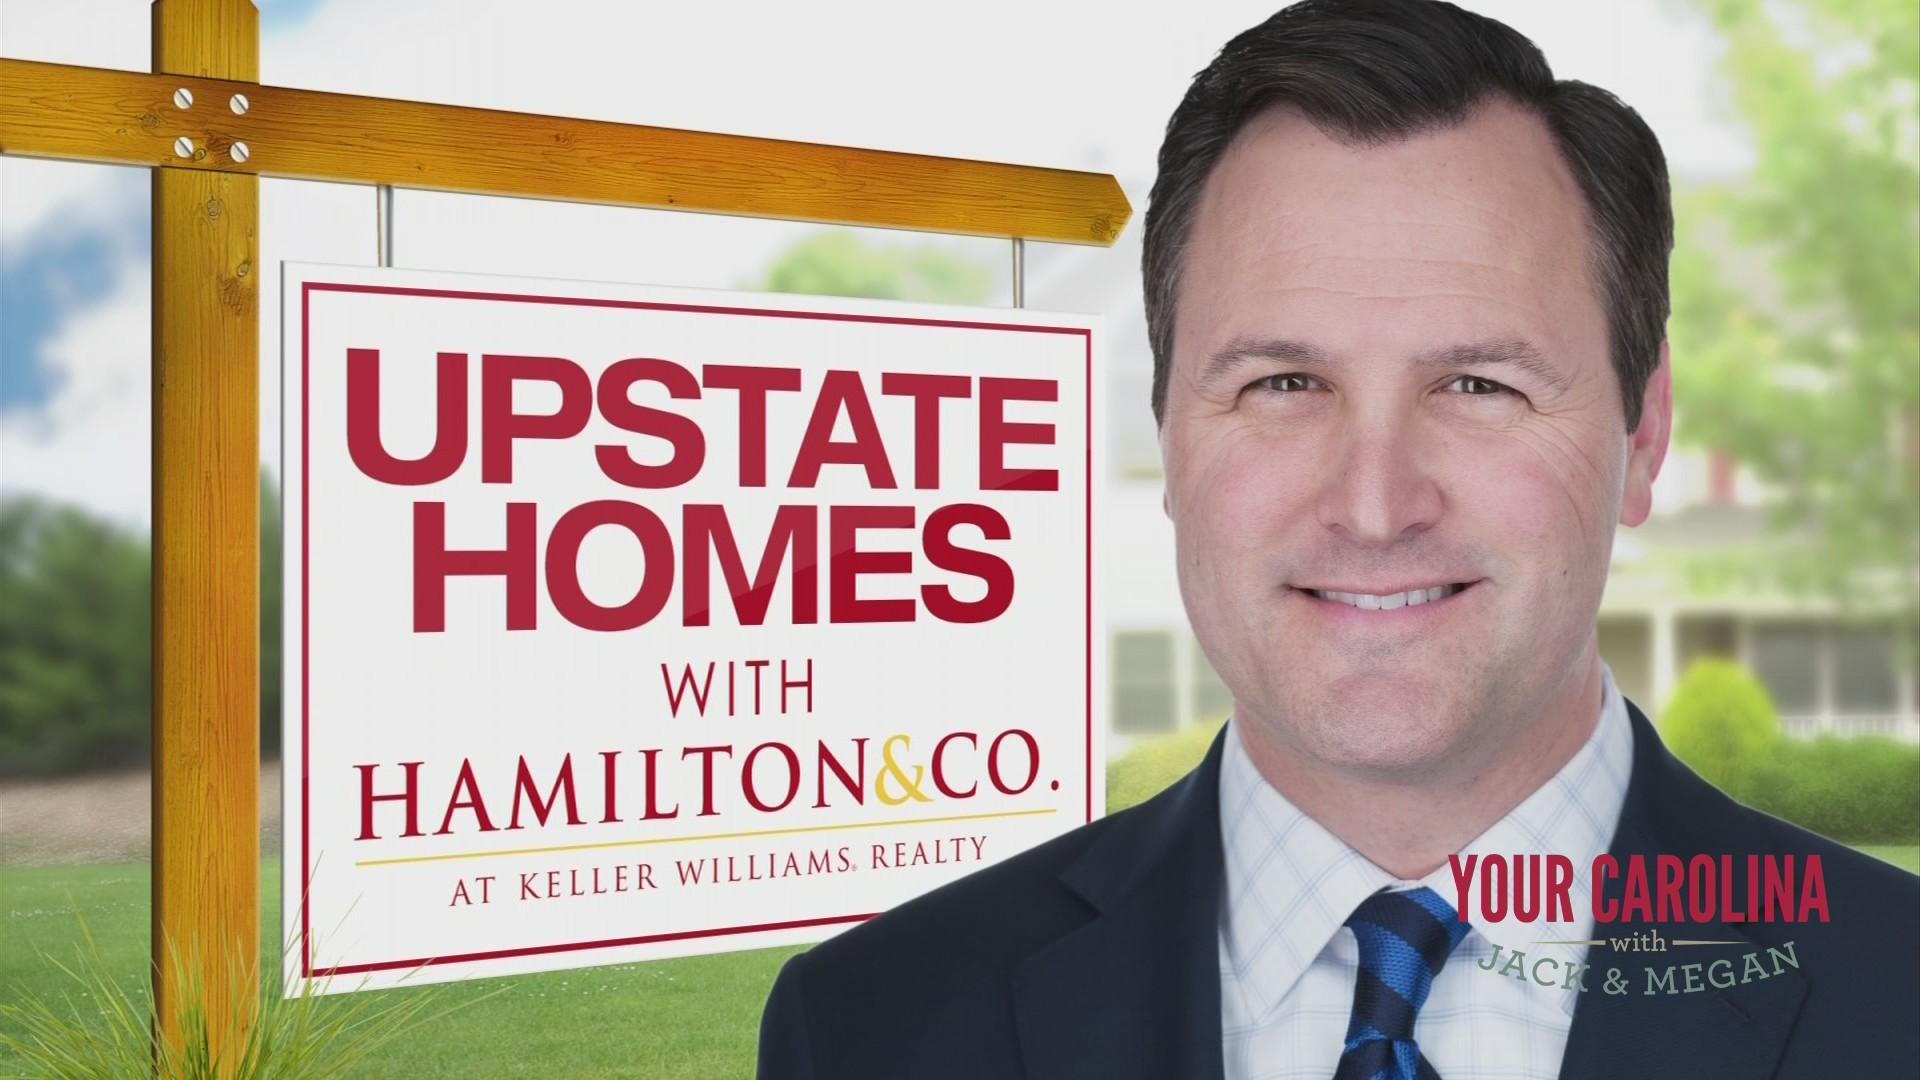 Upstate Homes - Listings June 28, 2018